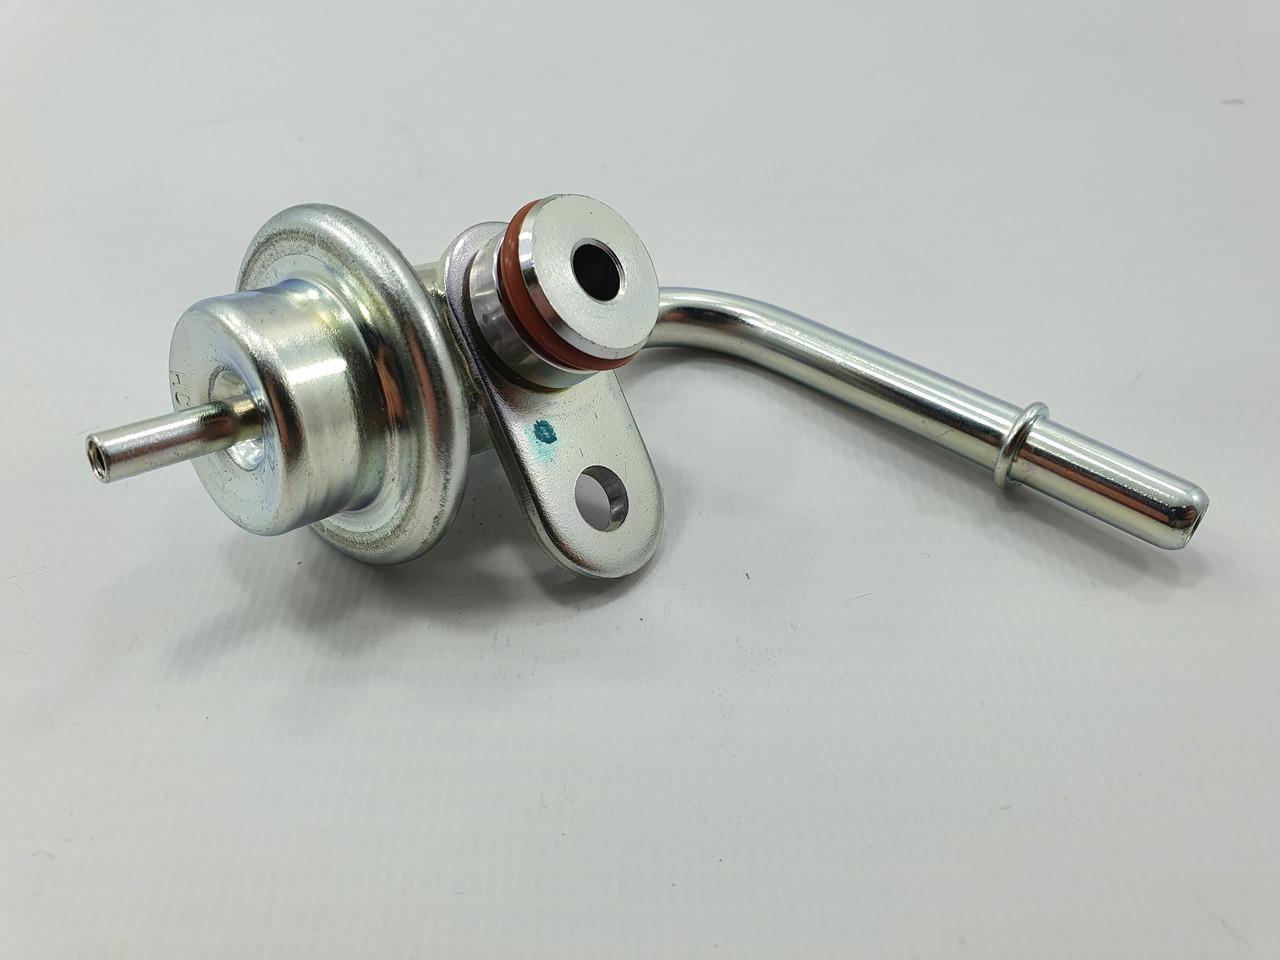 Регулятор давления топлива кривой  LANOS 1,5 /NEXIA 1.5 SOHC GM Корея (ориг)